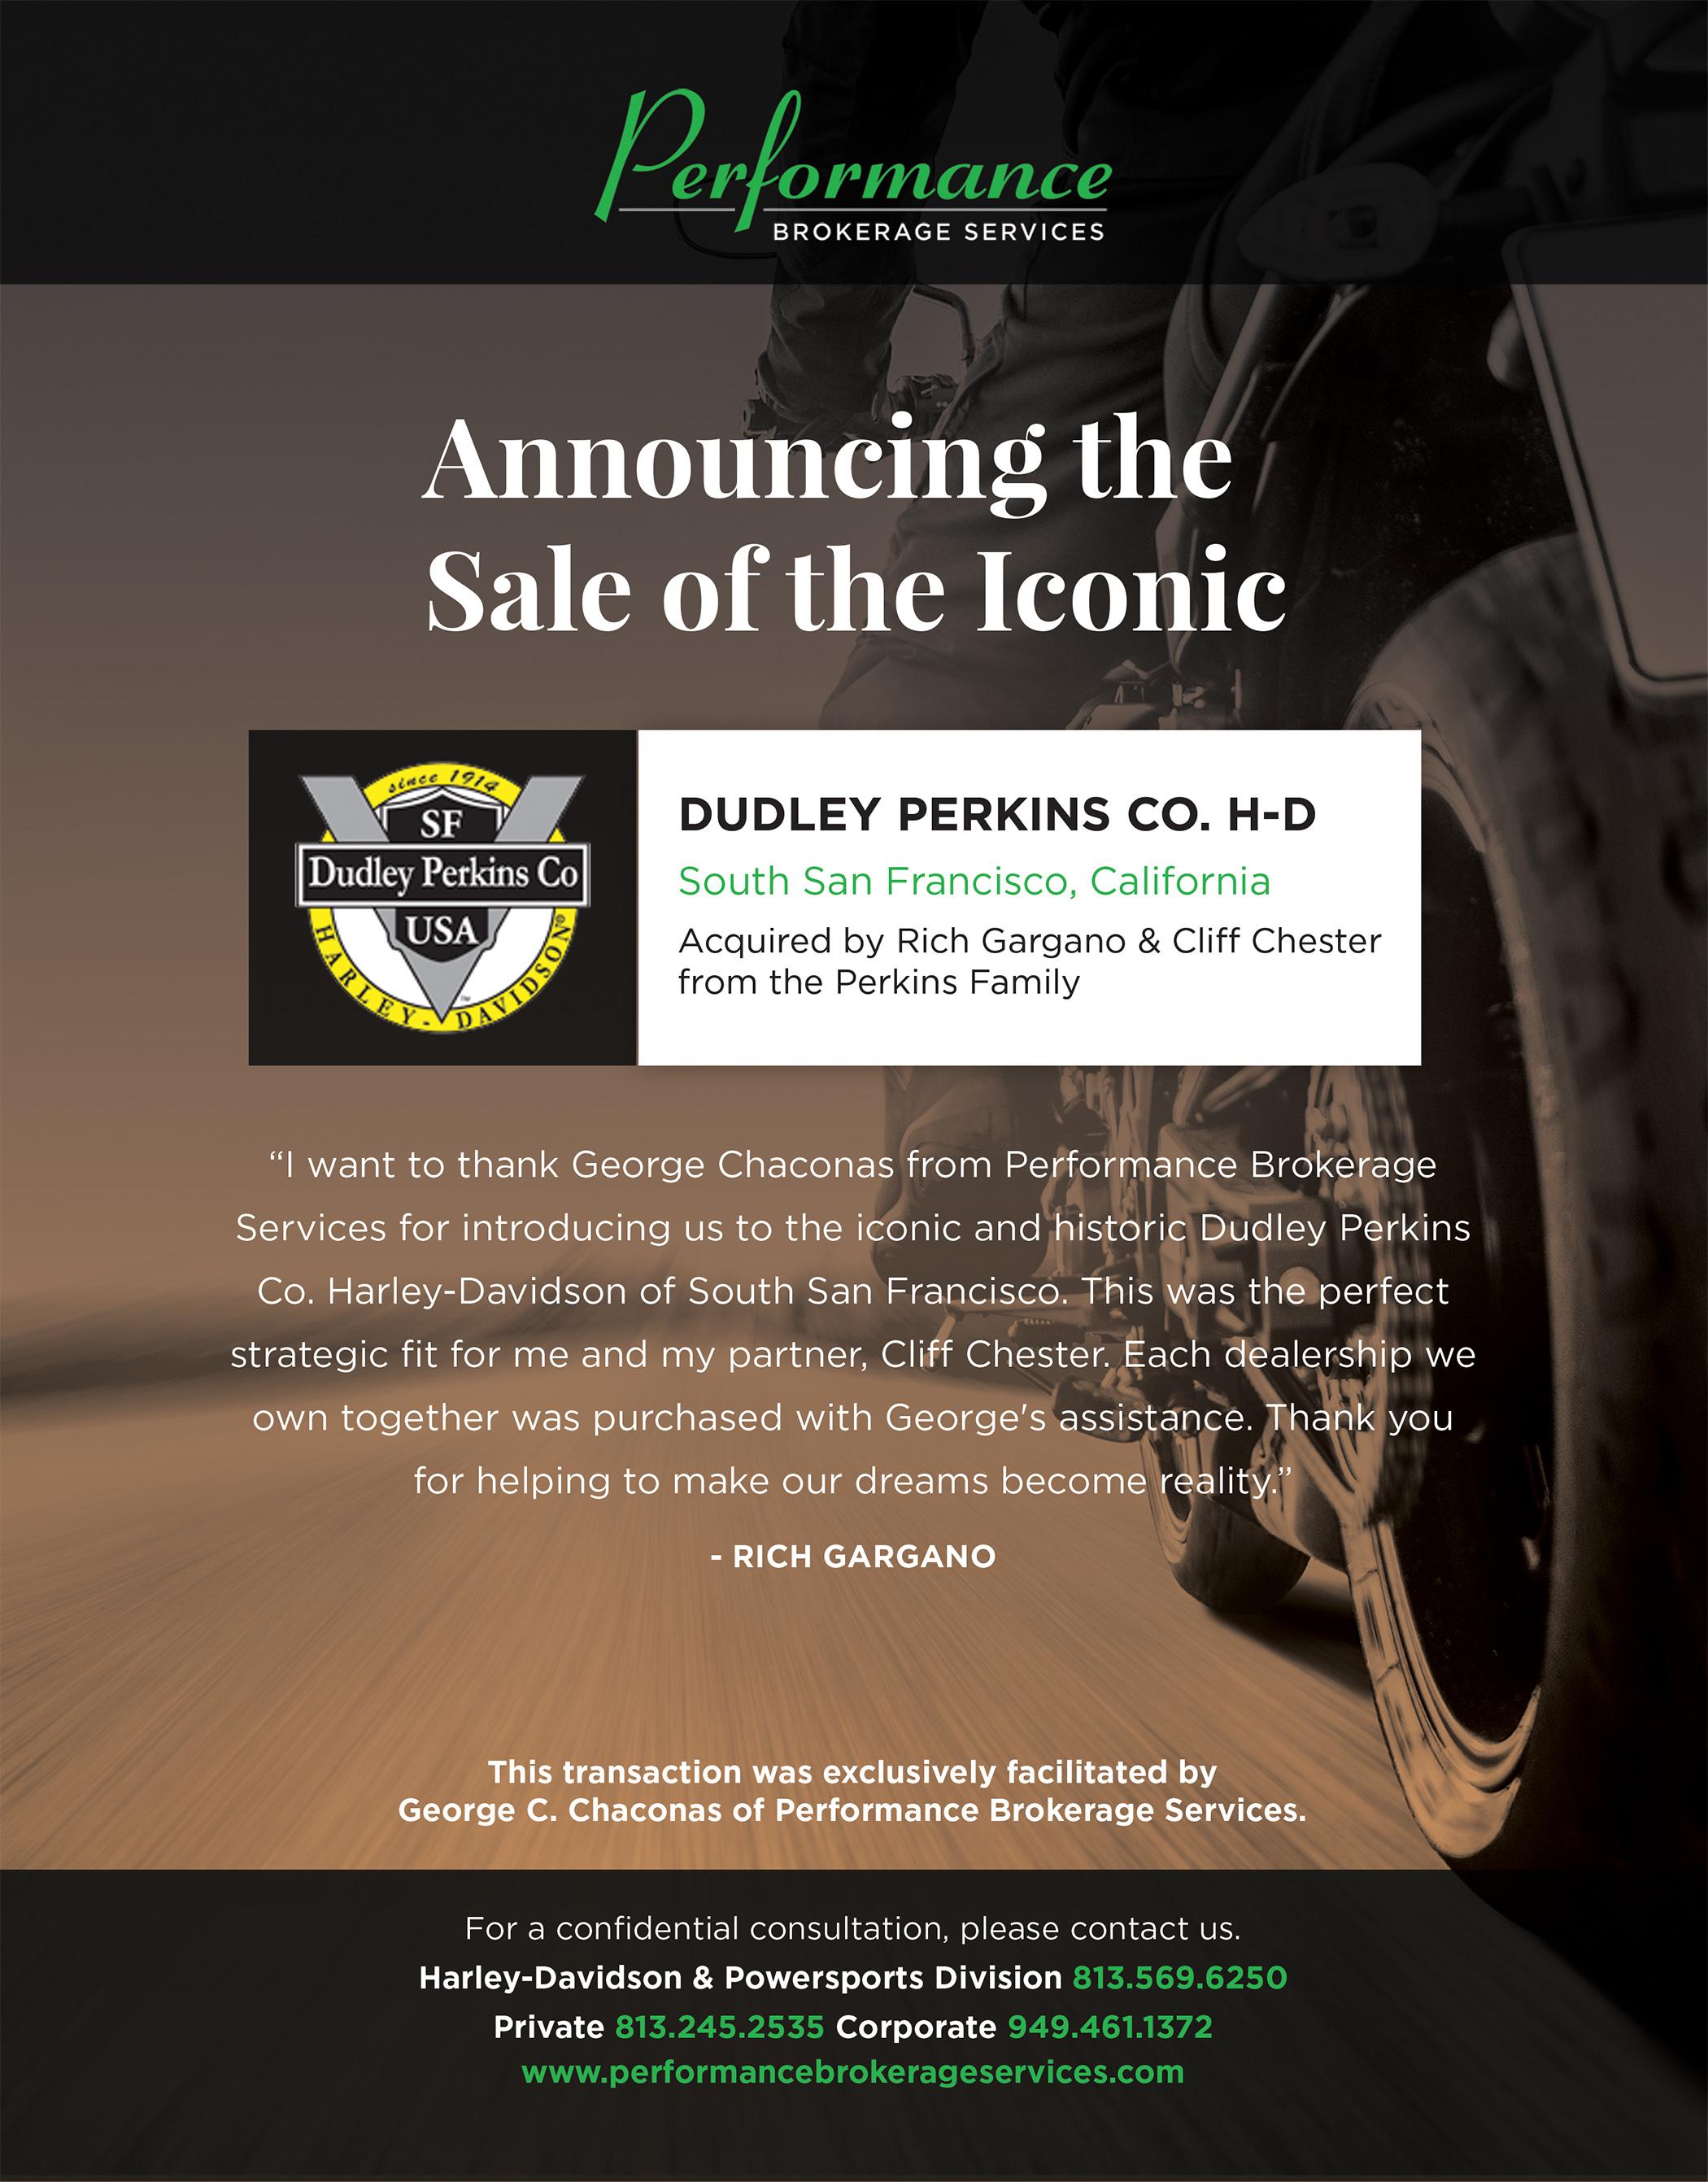 Dudley Perkins Co. Harley-Davidson